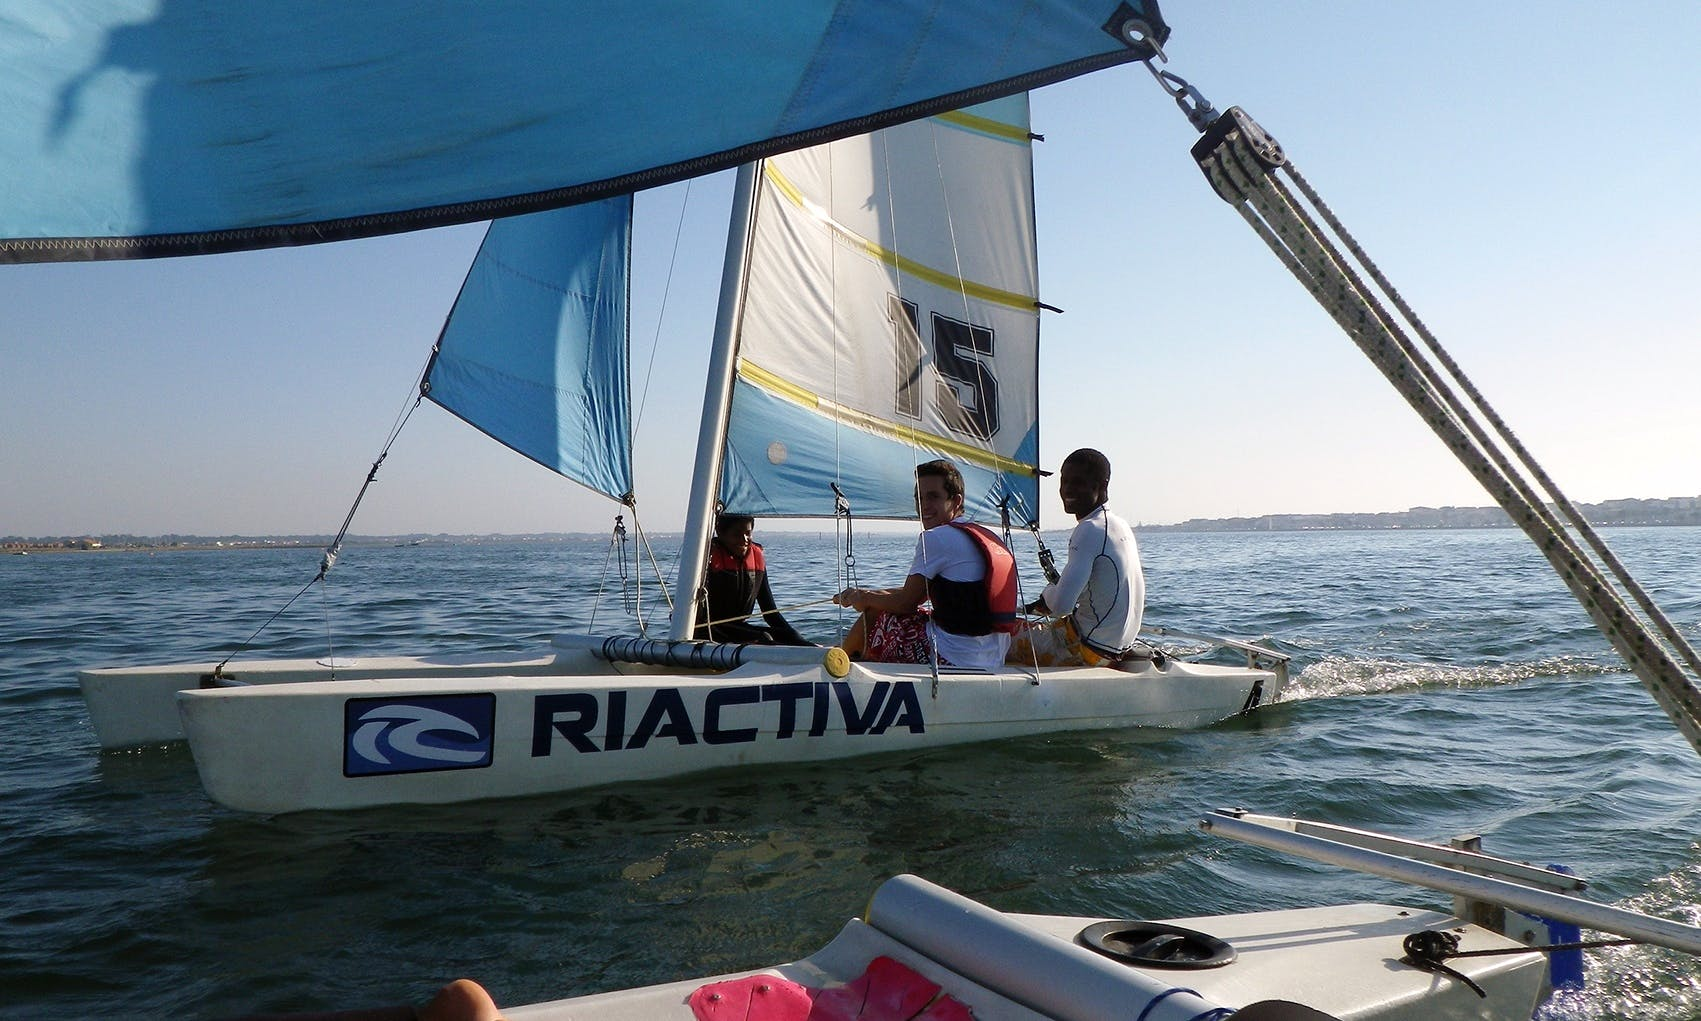 Beach Catamaran Rental and Courses in Aveiro